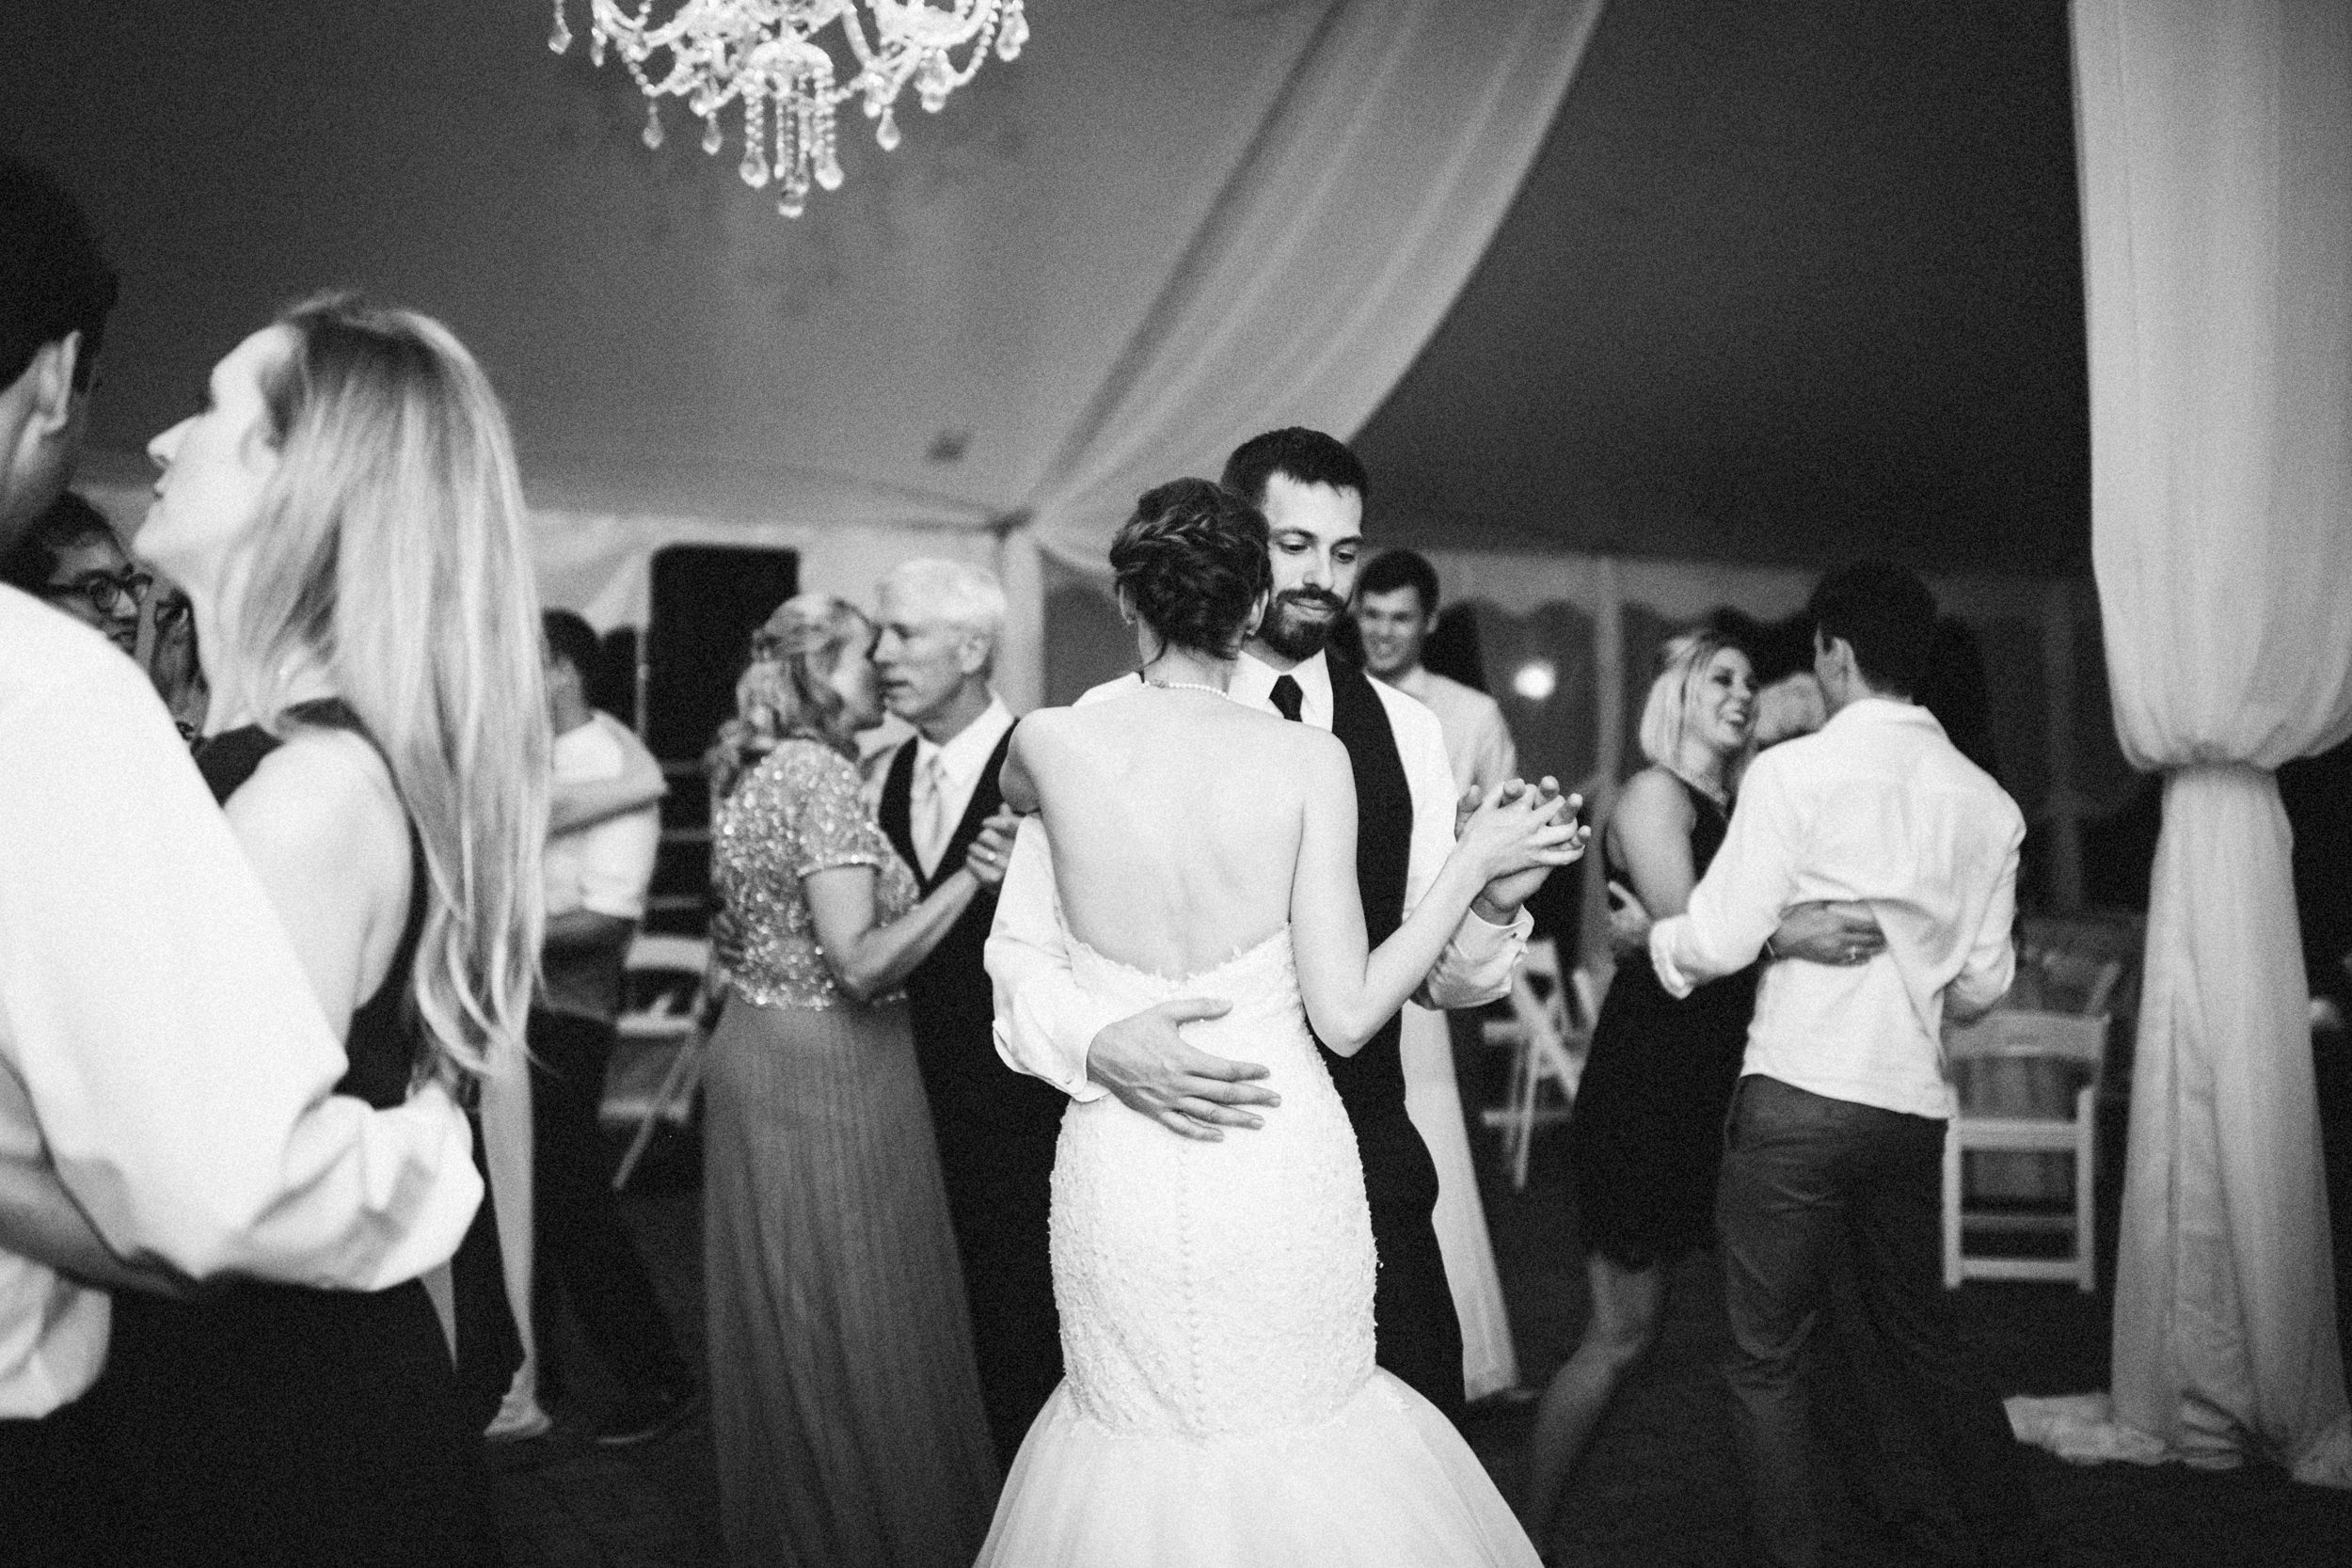 Louisville-Kentucky-Wedding-Elopement-Photographer-Sarah-Katherine-Davis-Photography-Whitehall-Classic-Timeless-Garden-Wedding-873.jpg